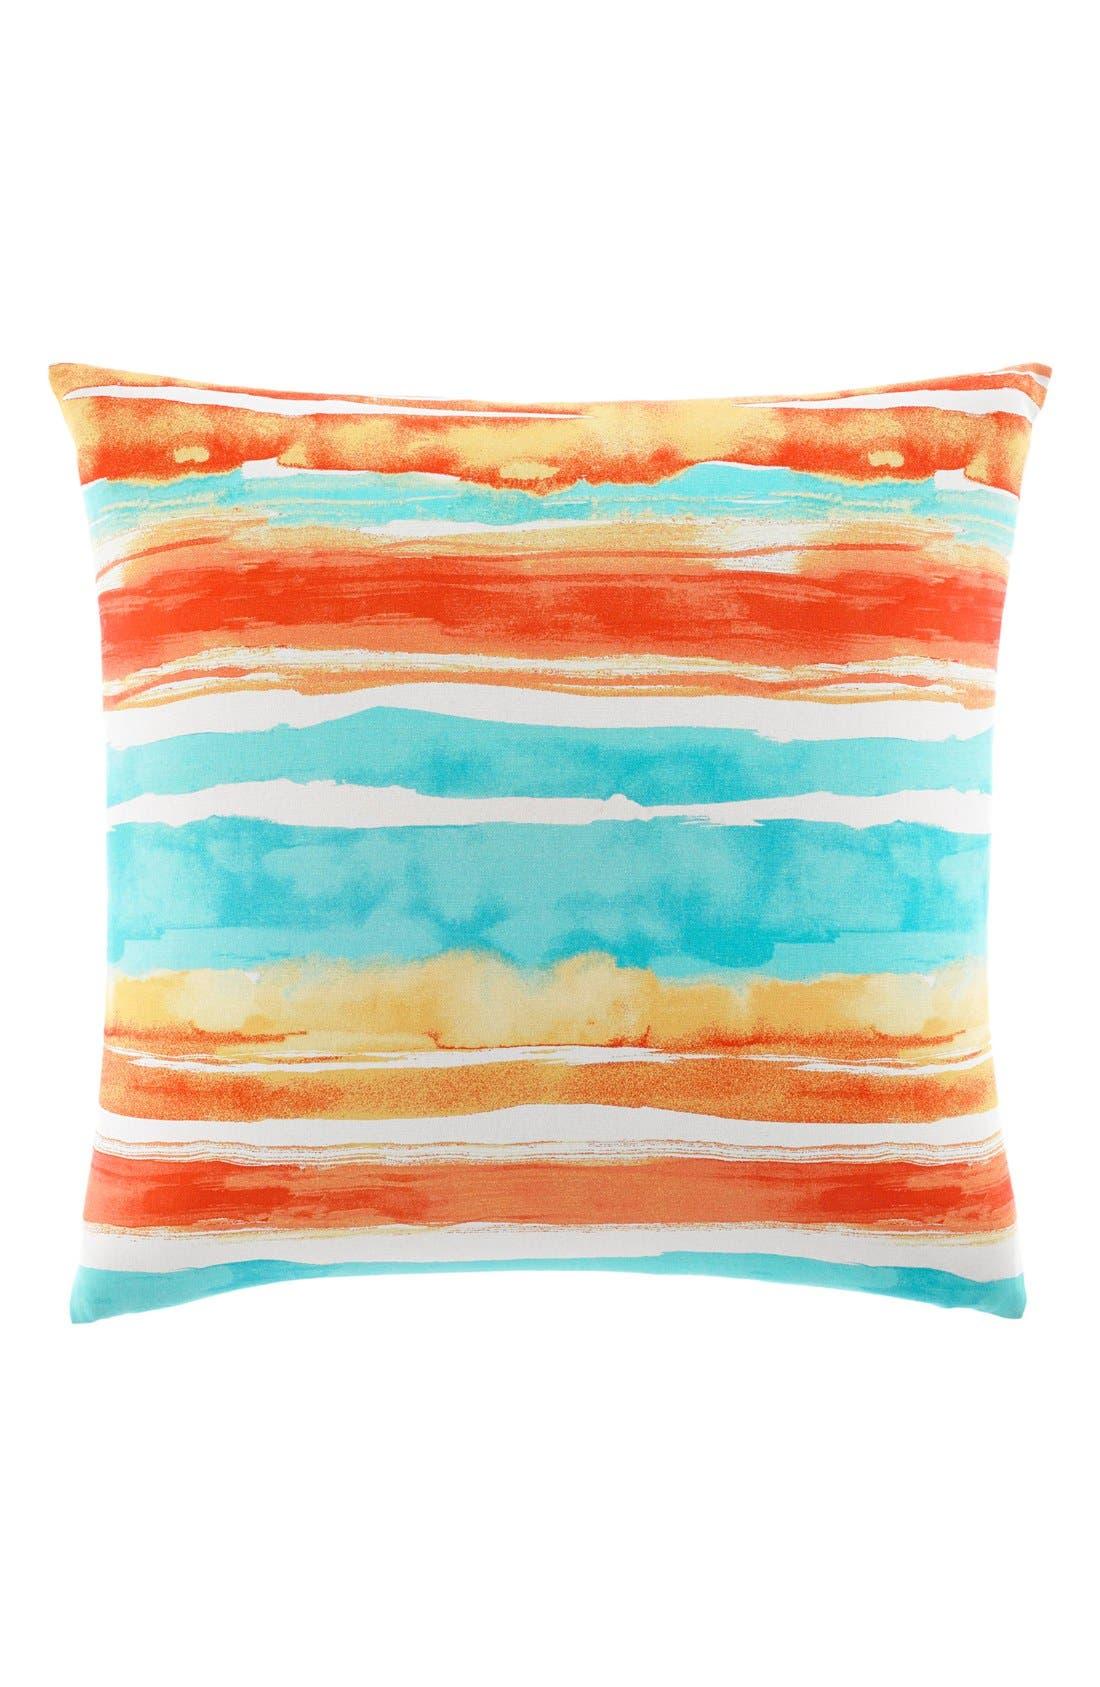 'Watercolor Stripe' Pillow,                         Main,                         color, Sunset Orange